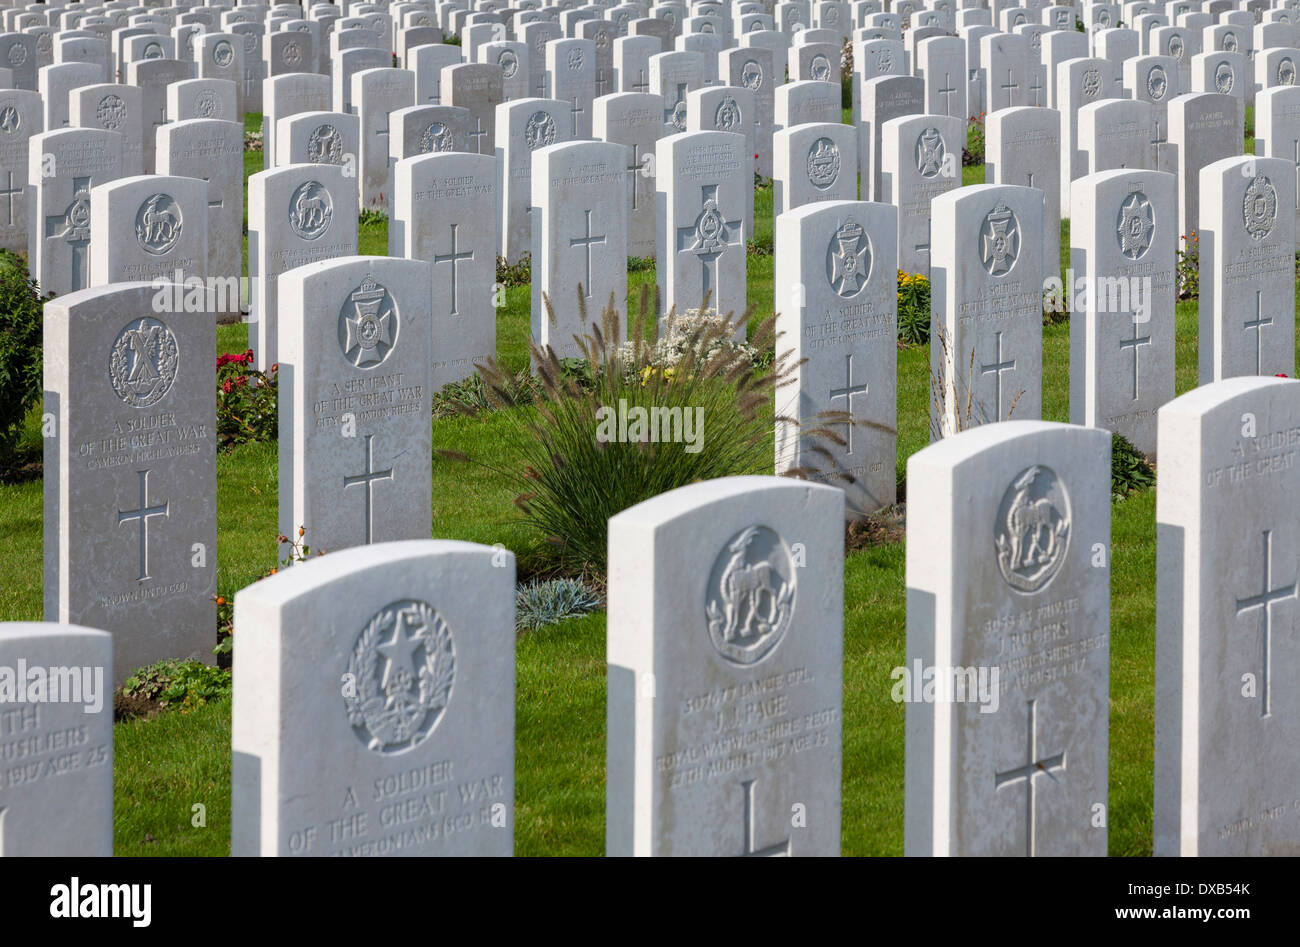 Tyne Cot Commonwealth War Graves Cemetery, Zonnebeke, Belgium - Stock Image